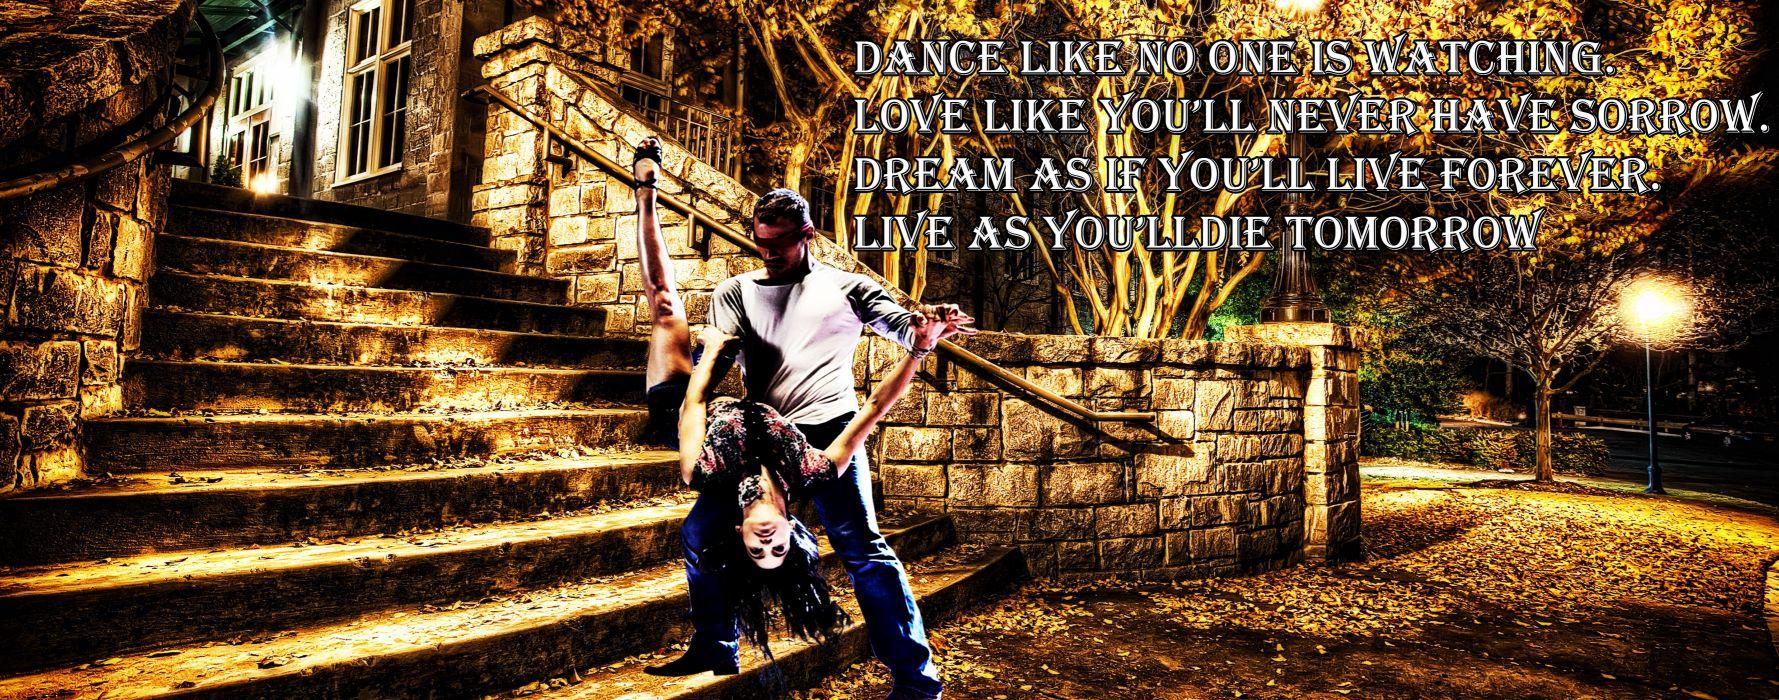 Dance like no one wallpaper